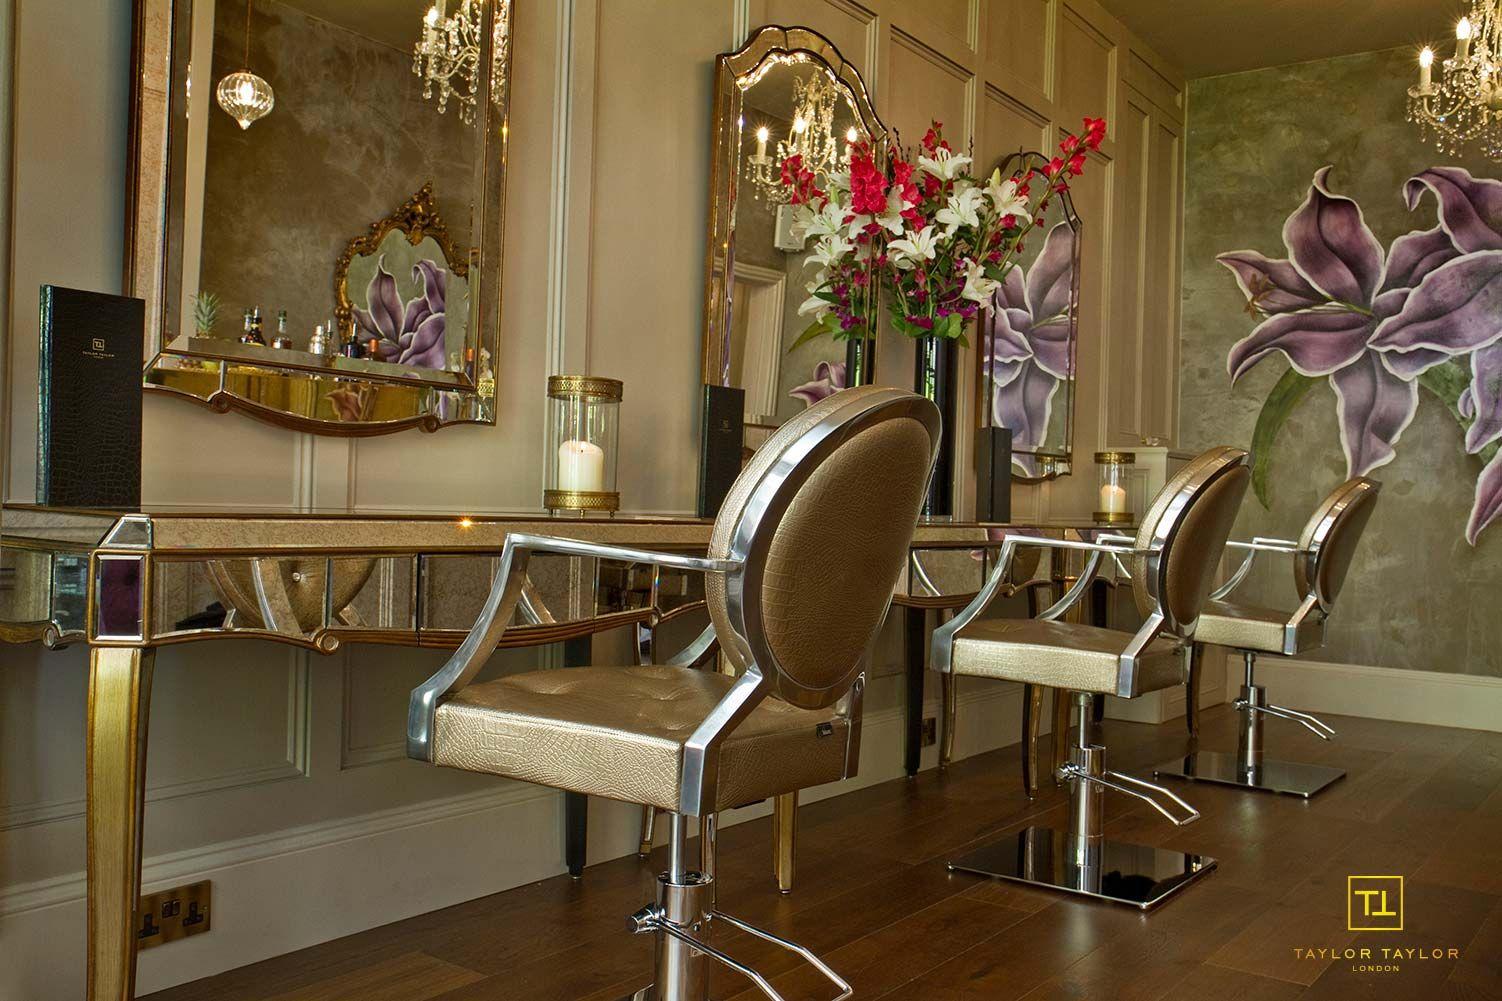 Interior design Salon Barbers Spa Nail Bars etc wwwsalonsites